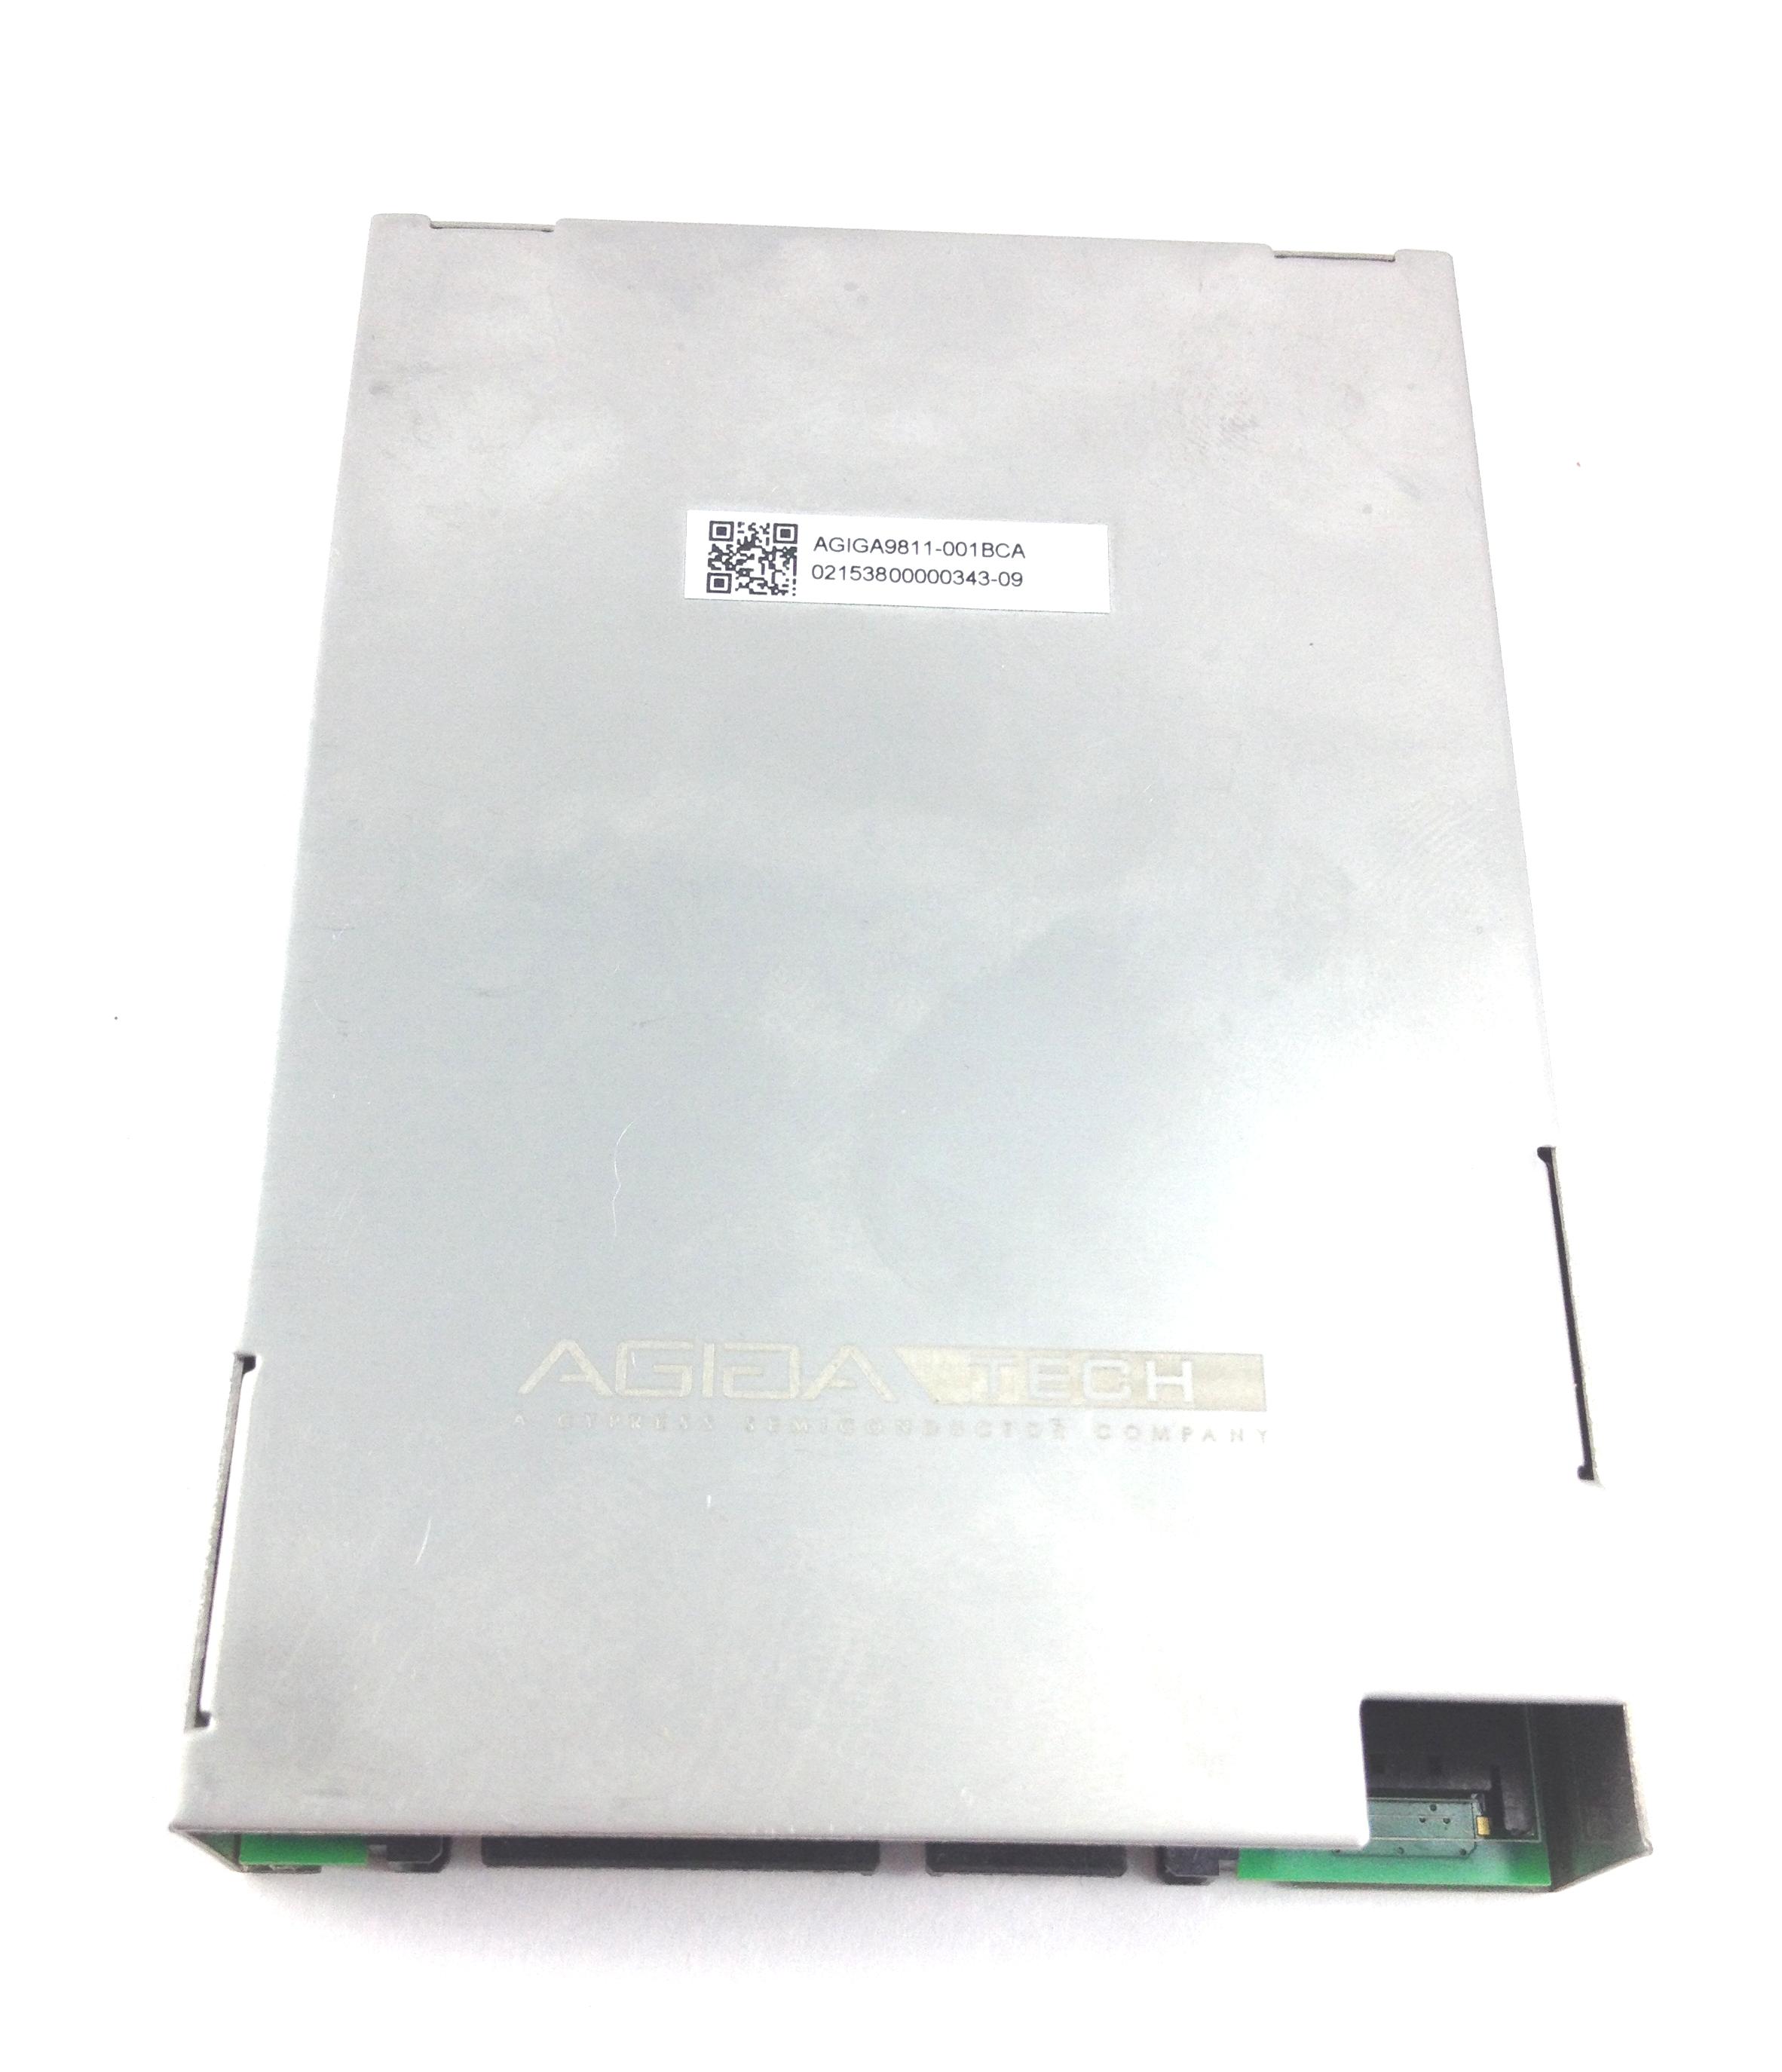 DIAMOND4 POWERGEM, 2.5'' DRIVE FORM FACTOR (AGIGA9811-001BCA)